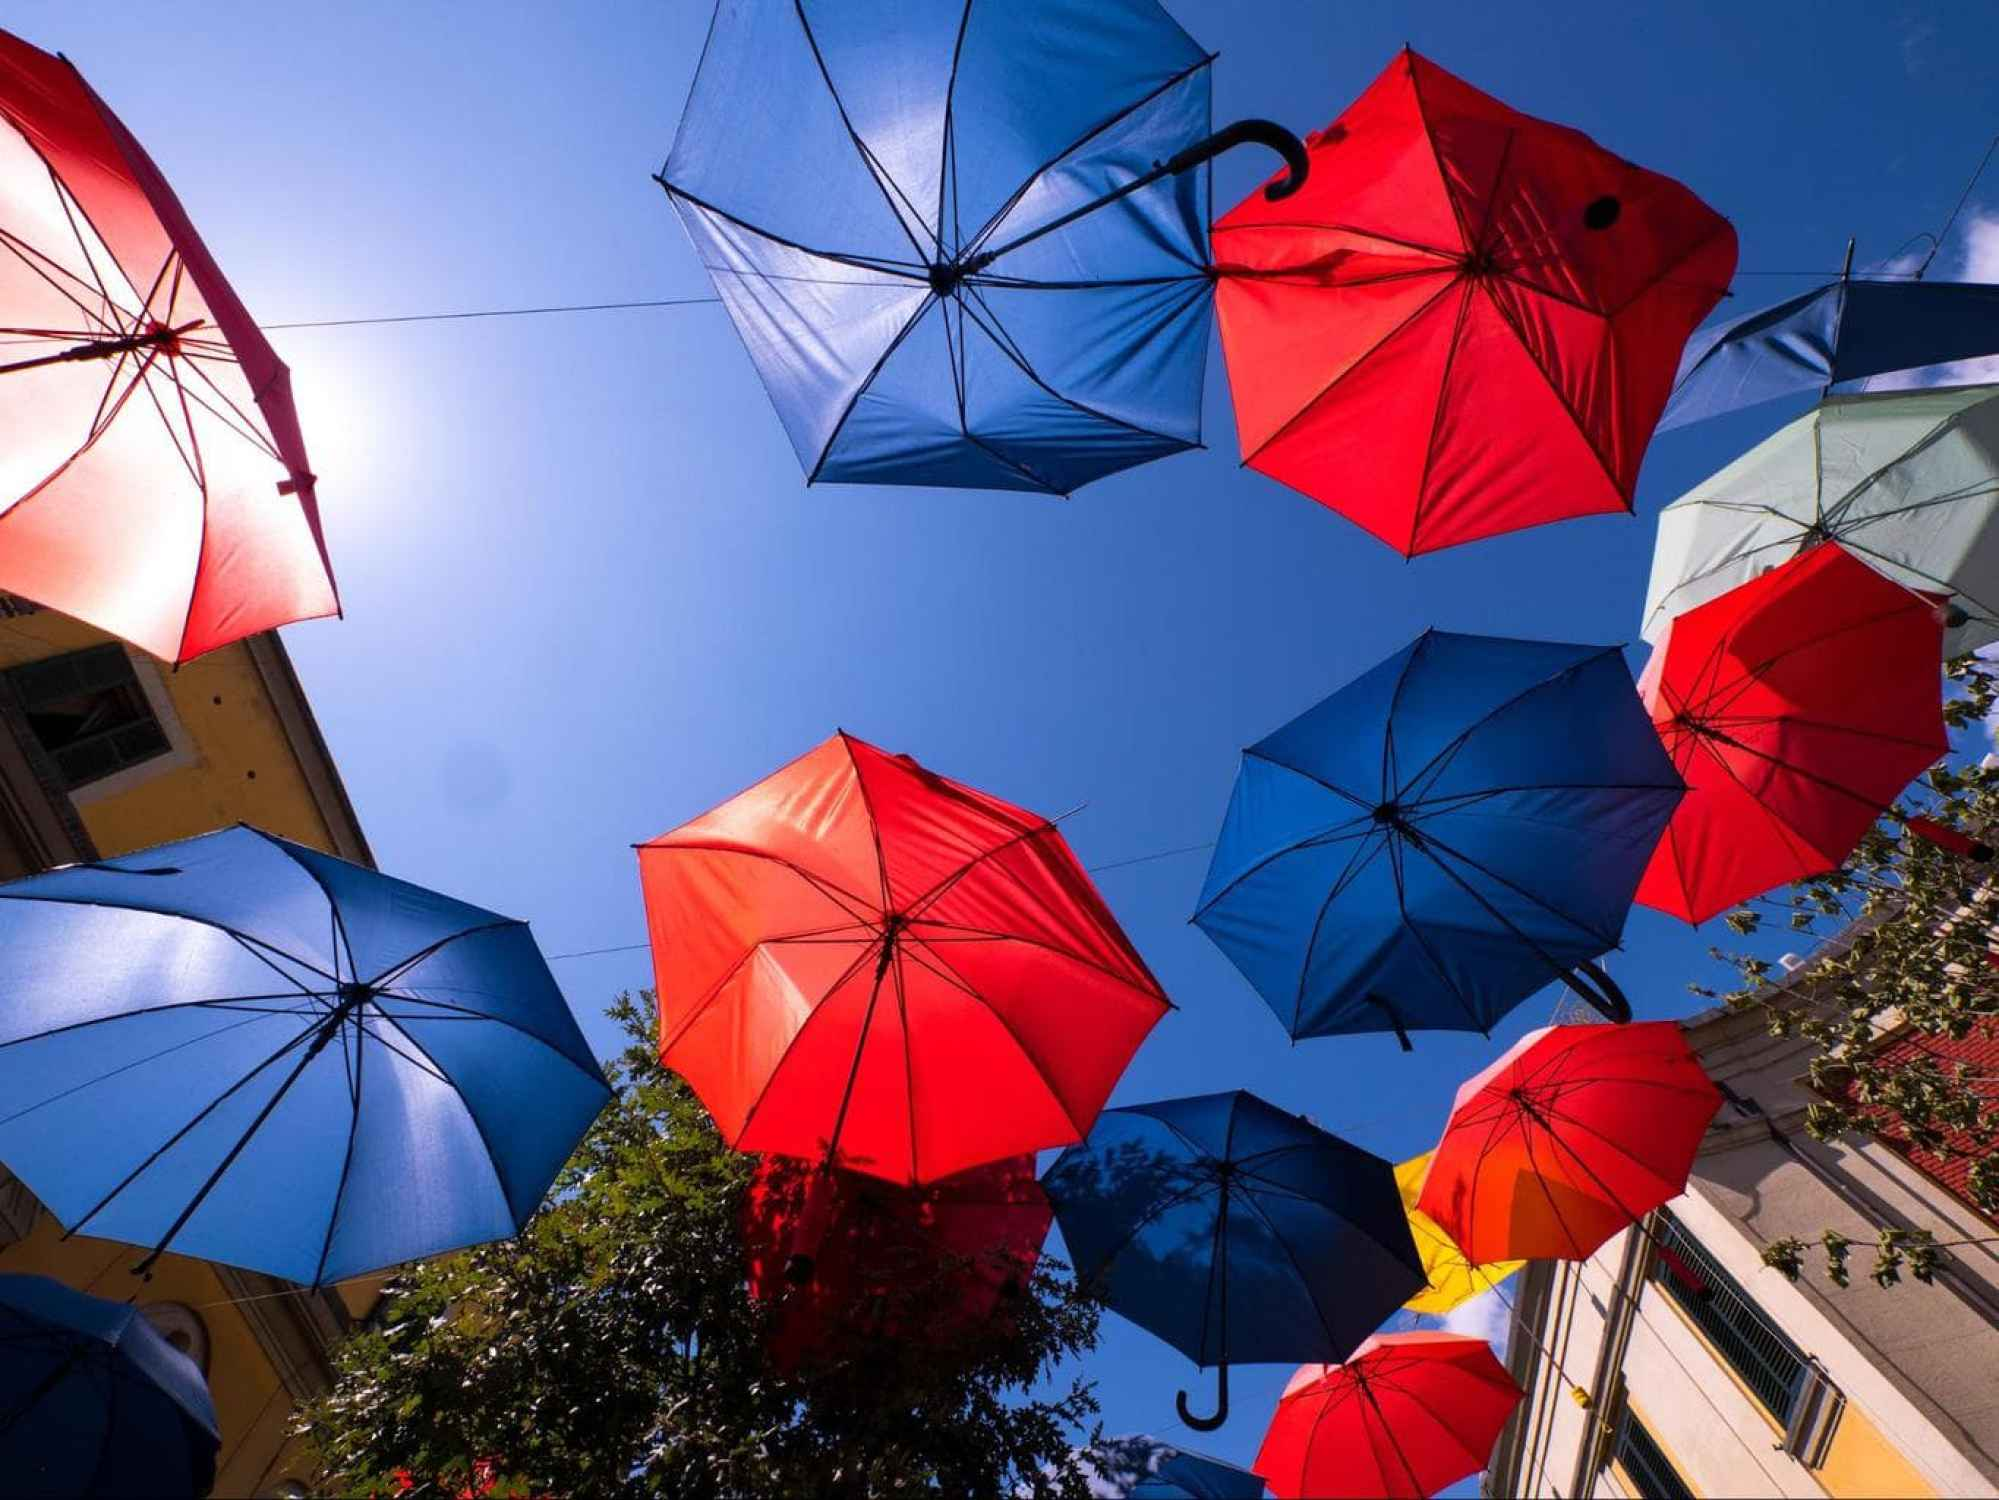 Upside down umbrellas in Tirana